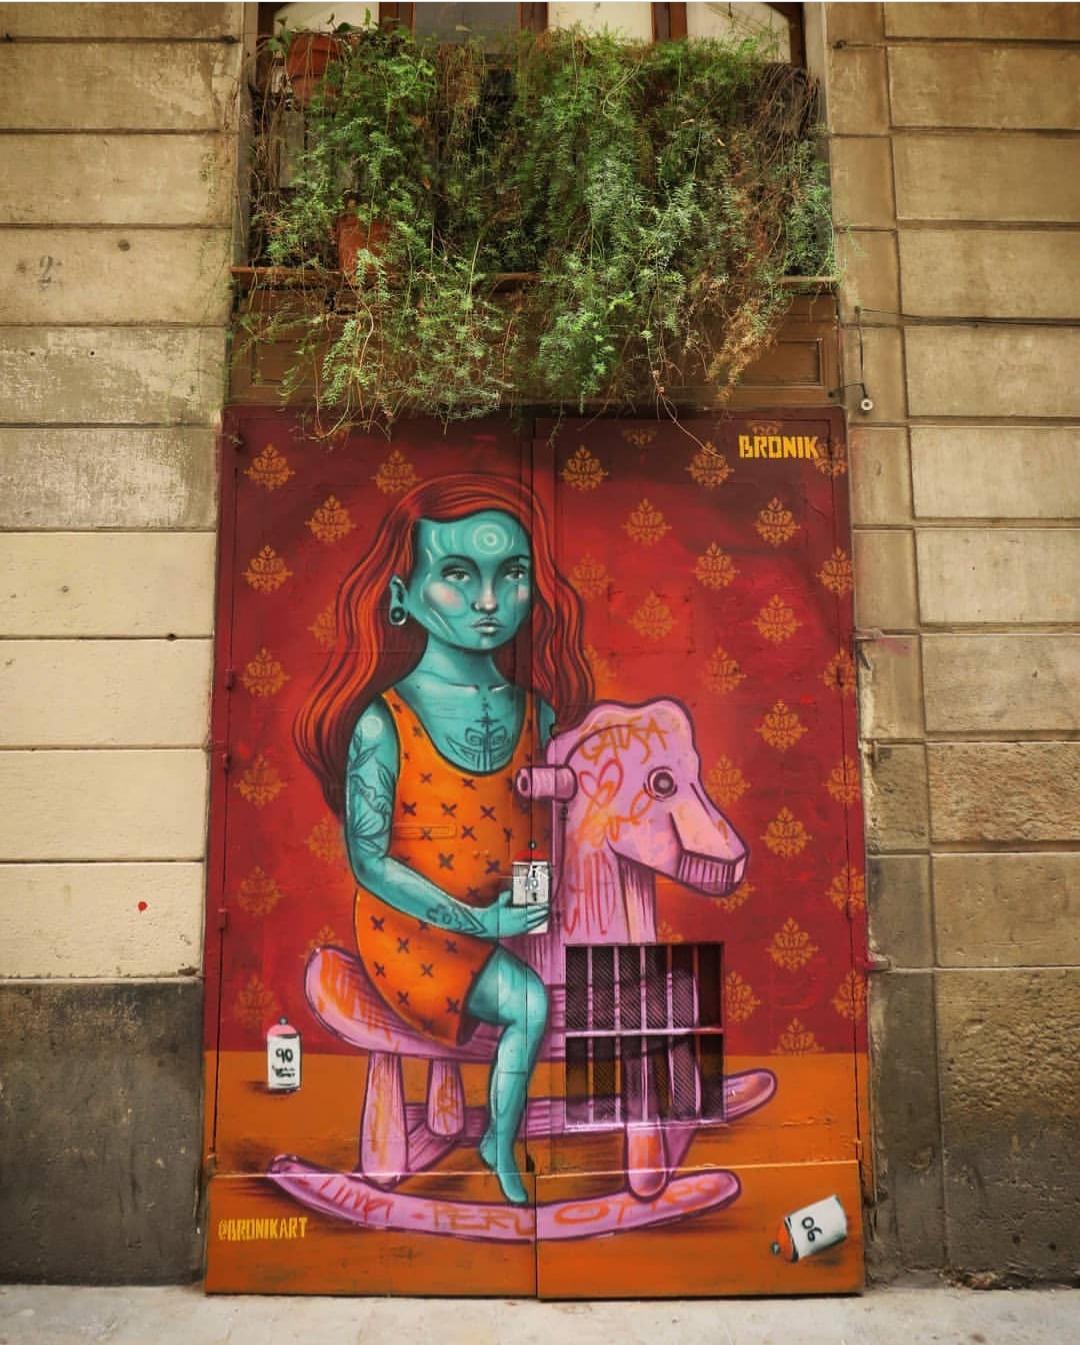 bronik street art